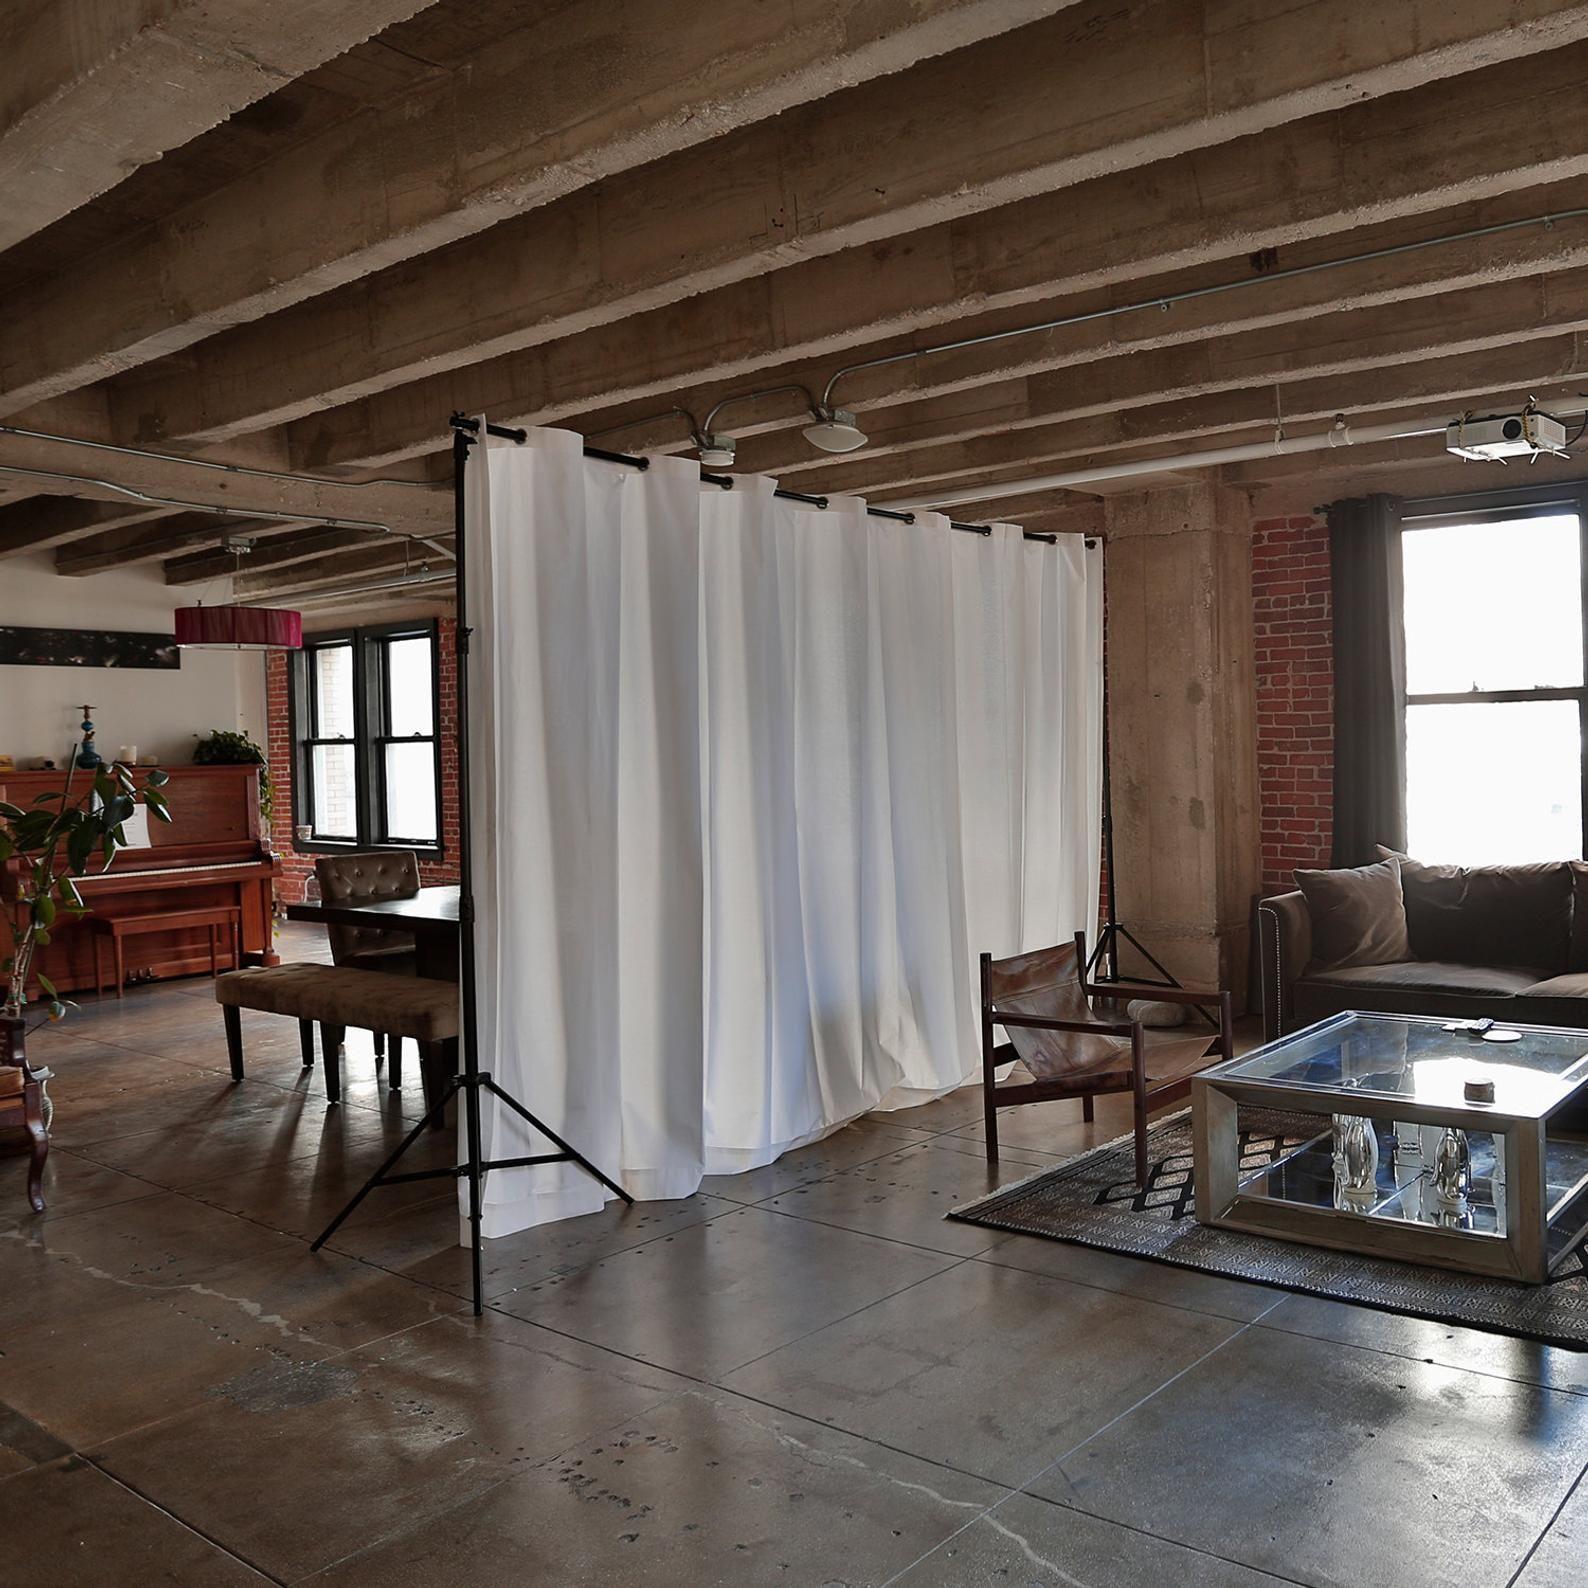 Muslin Freestanding Room Divider Kit For Rooms 8ft To 9ft Etsy In 2021 Freestanding Room Divider Studio Apartment Divider Glass Room Divider